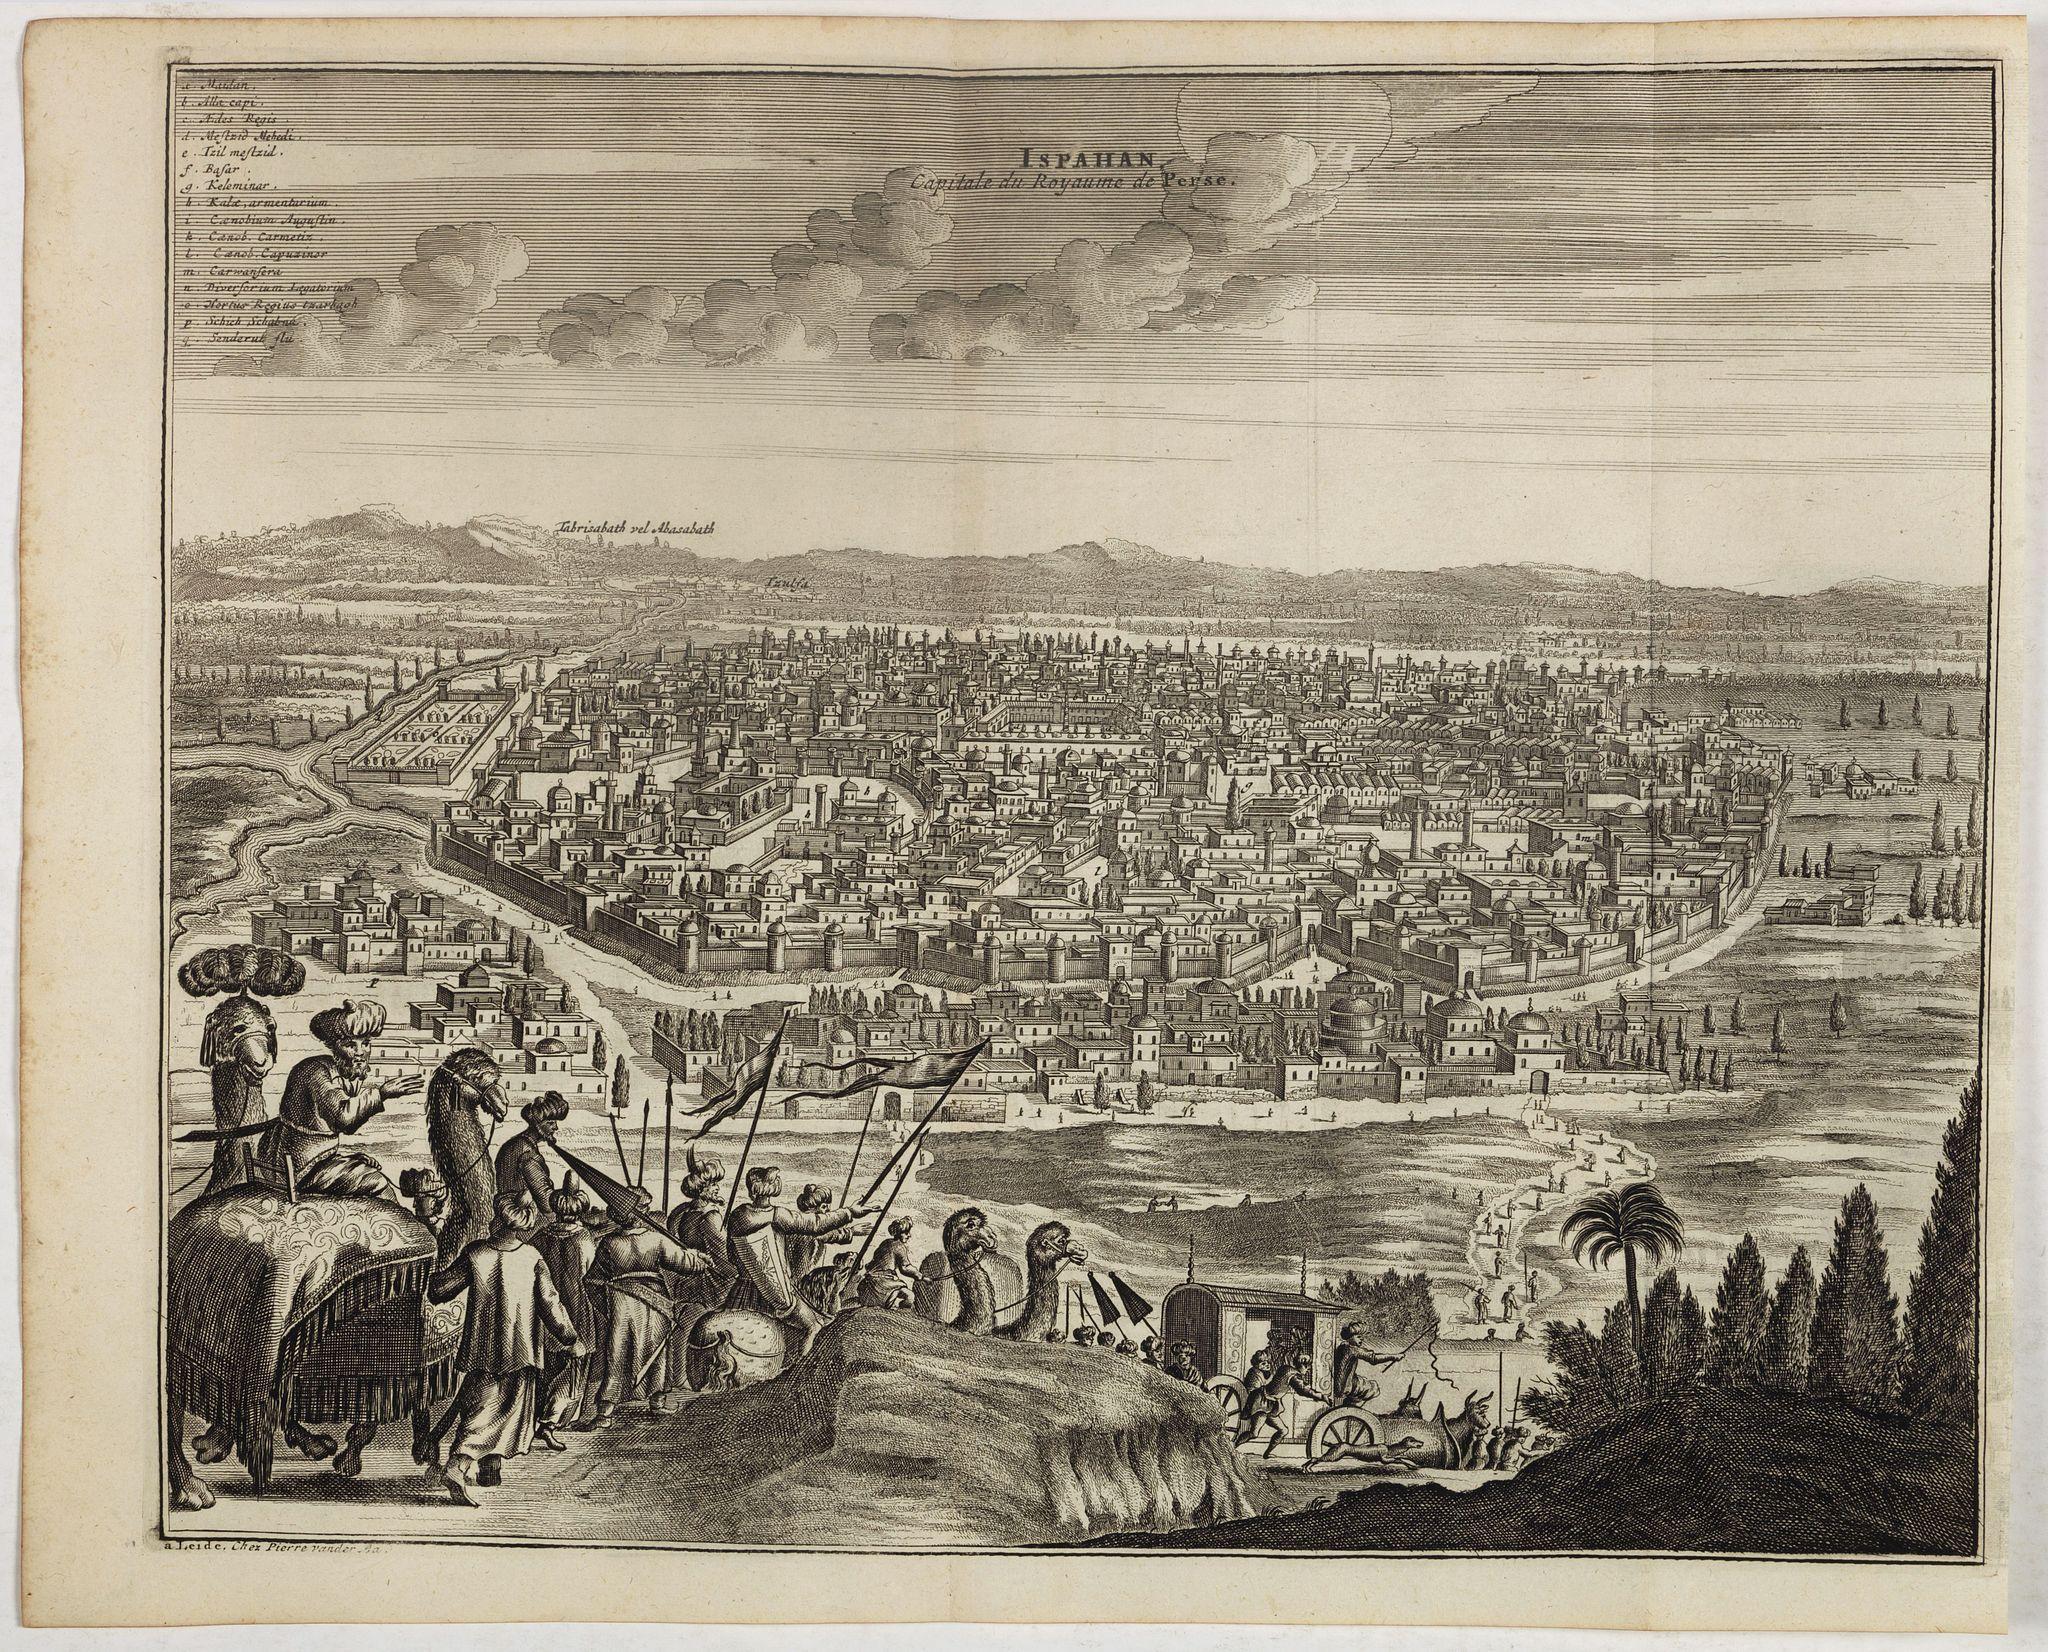 VAN DER AA, P. / OLEARIUS, A. -  Ispahan, capitale du Royaume de Perse. (Isfahan)